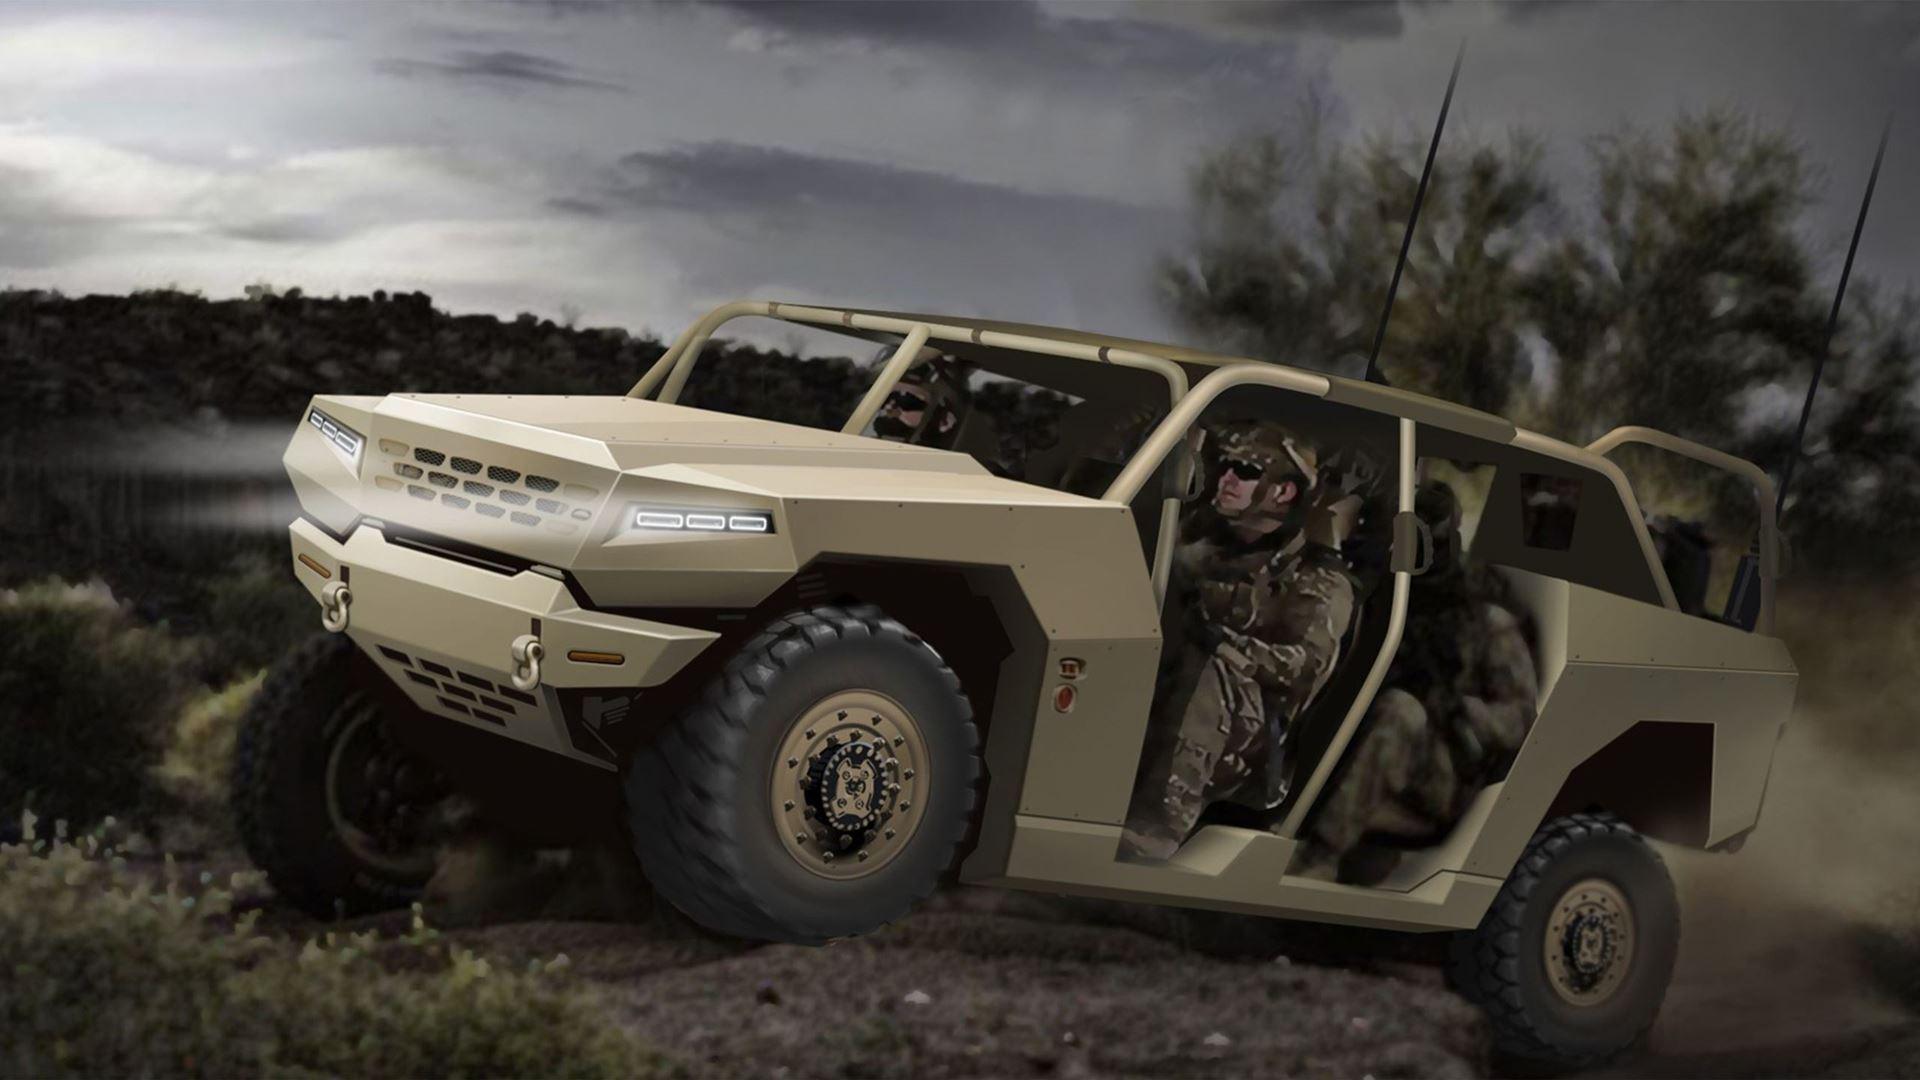 Kia Motors accelerates development of combat vehicles with new military standard platform - Image 1